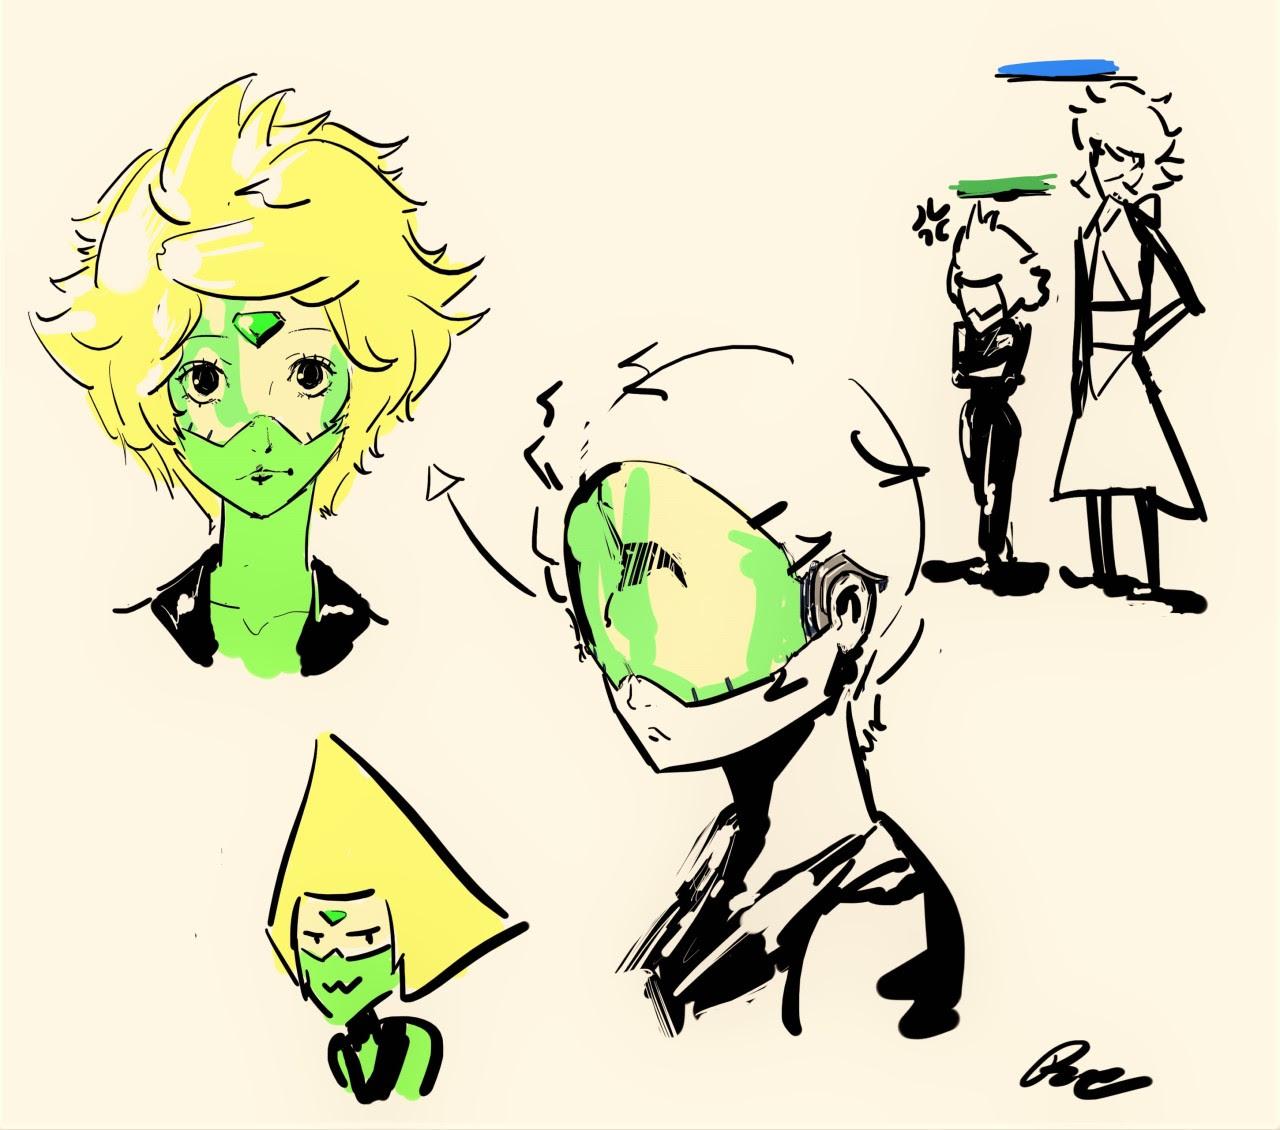 Quick doodles.